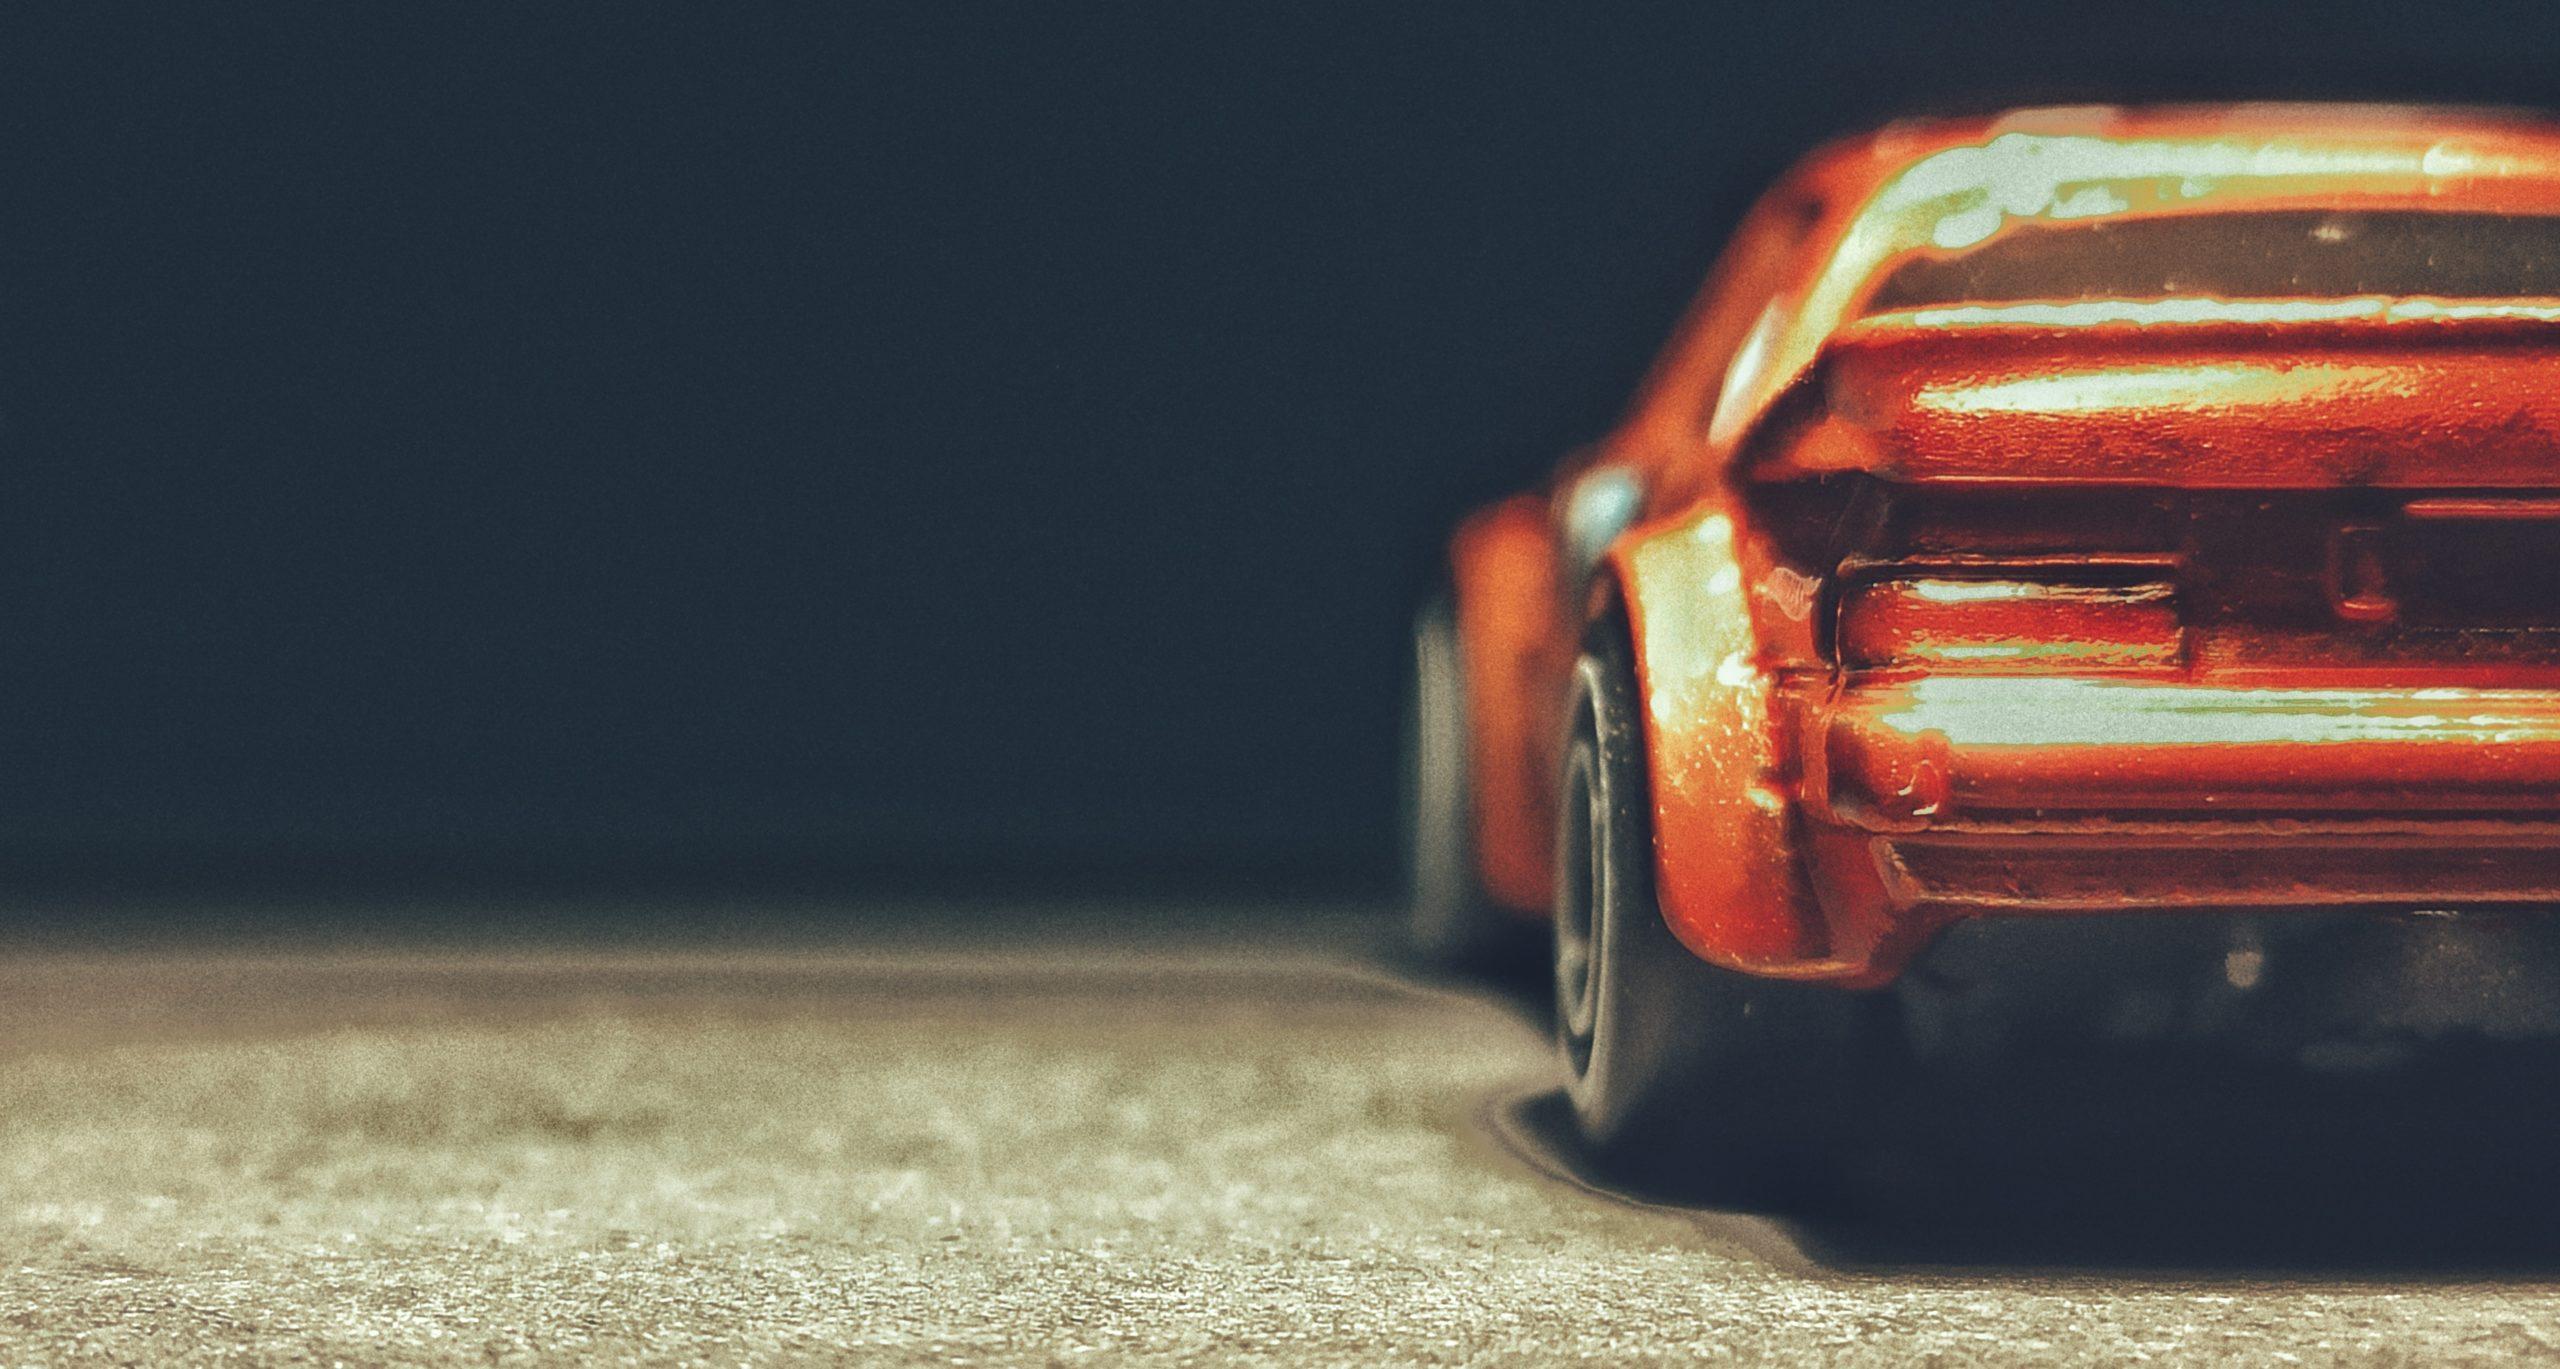 Hot Wheels Mazda RX-7 (GHG28) 2020 (130/250) Speed Blur (5/5) spectraflame orange Super Treasure Hunt (STH) back angle